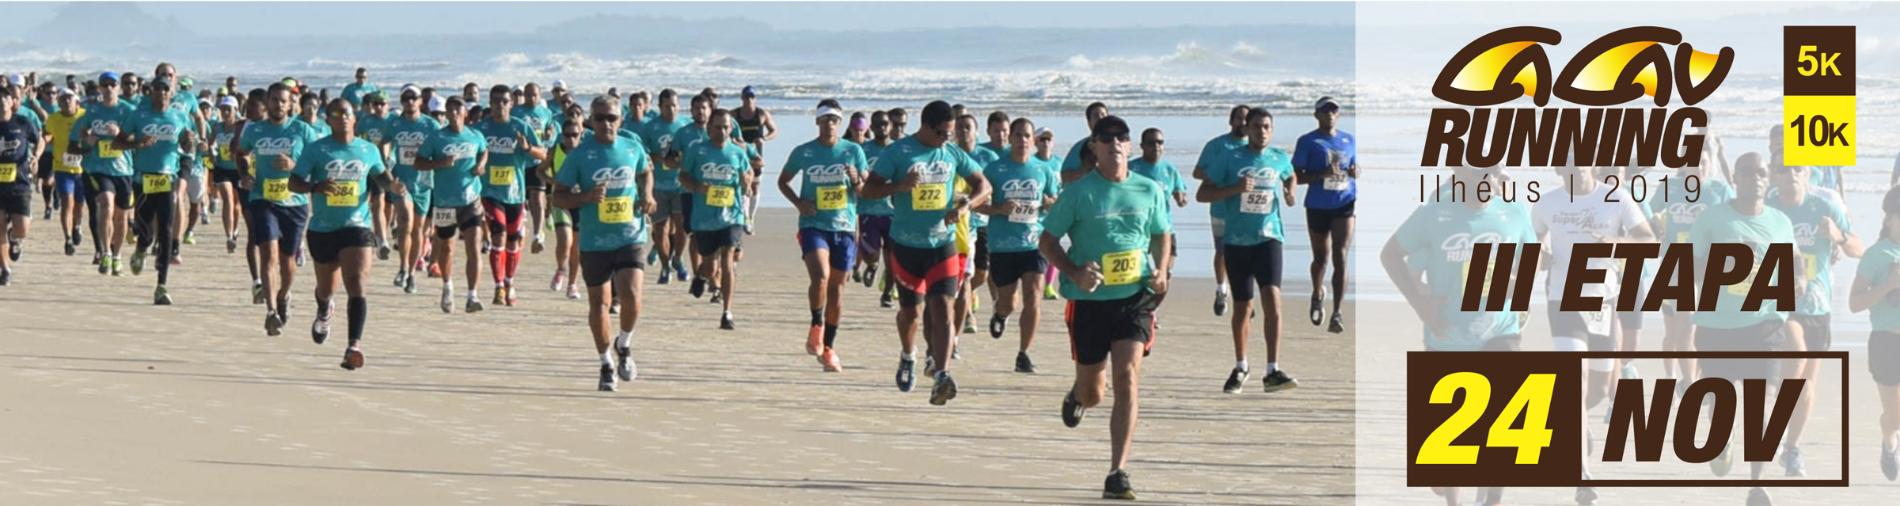 CIRCUITO CACAU RUNNING 2019 - 3ª ETAPA